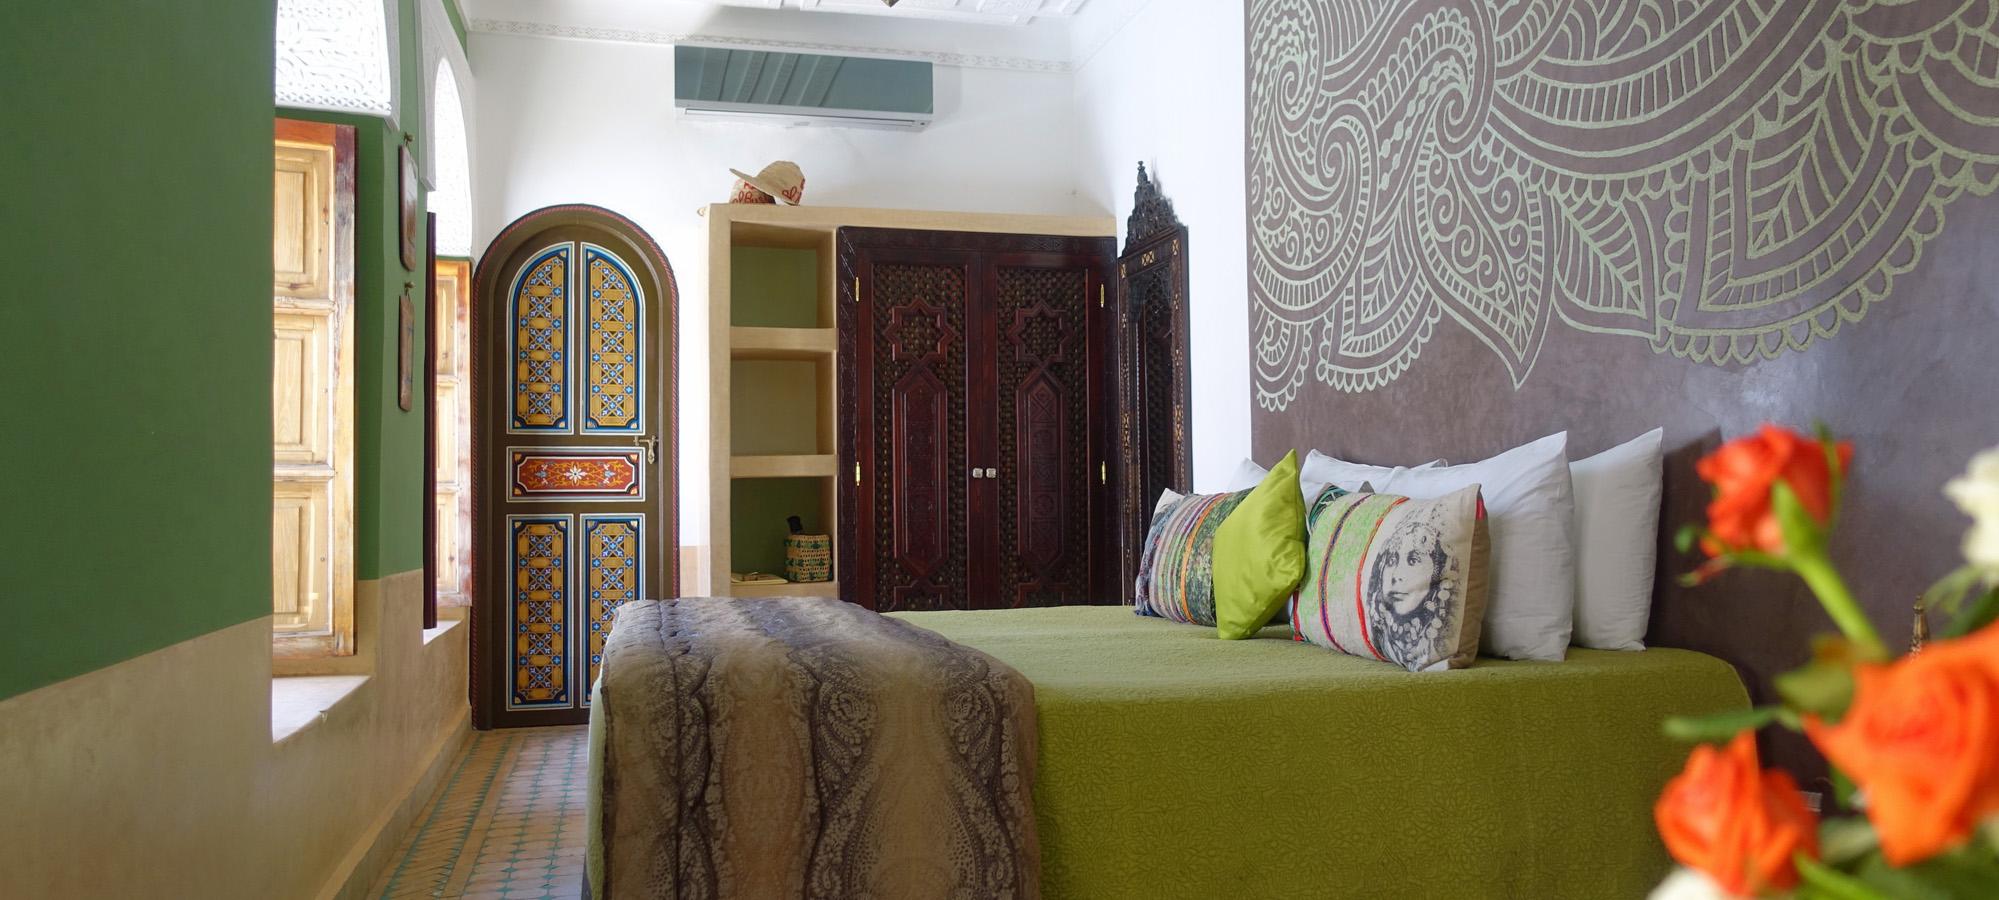 1. Akhdar Bed